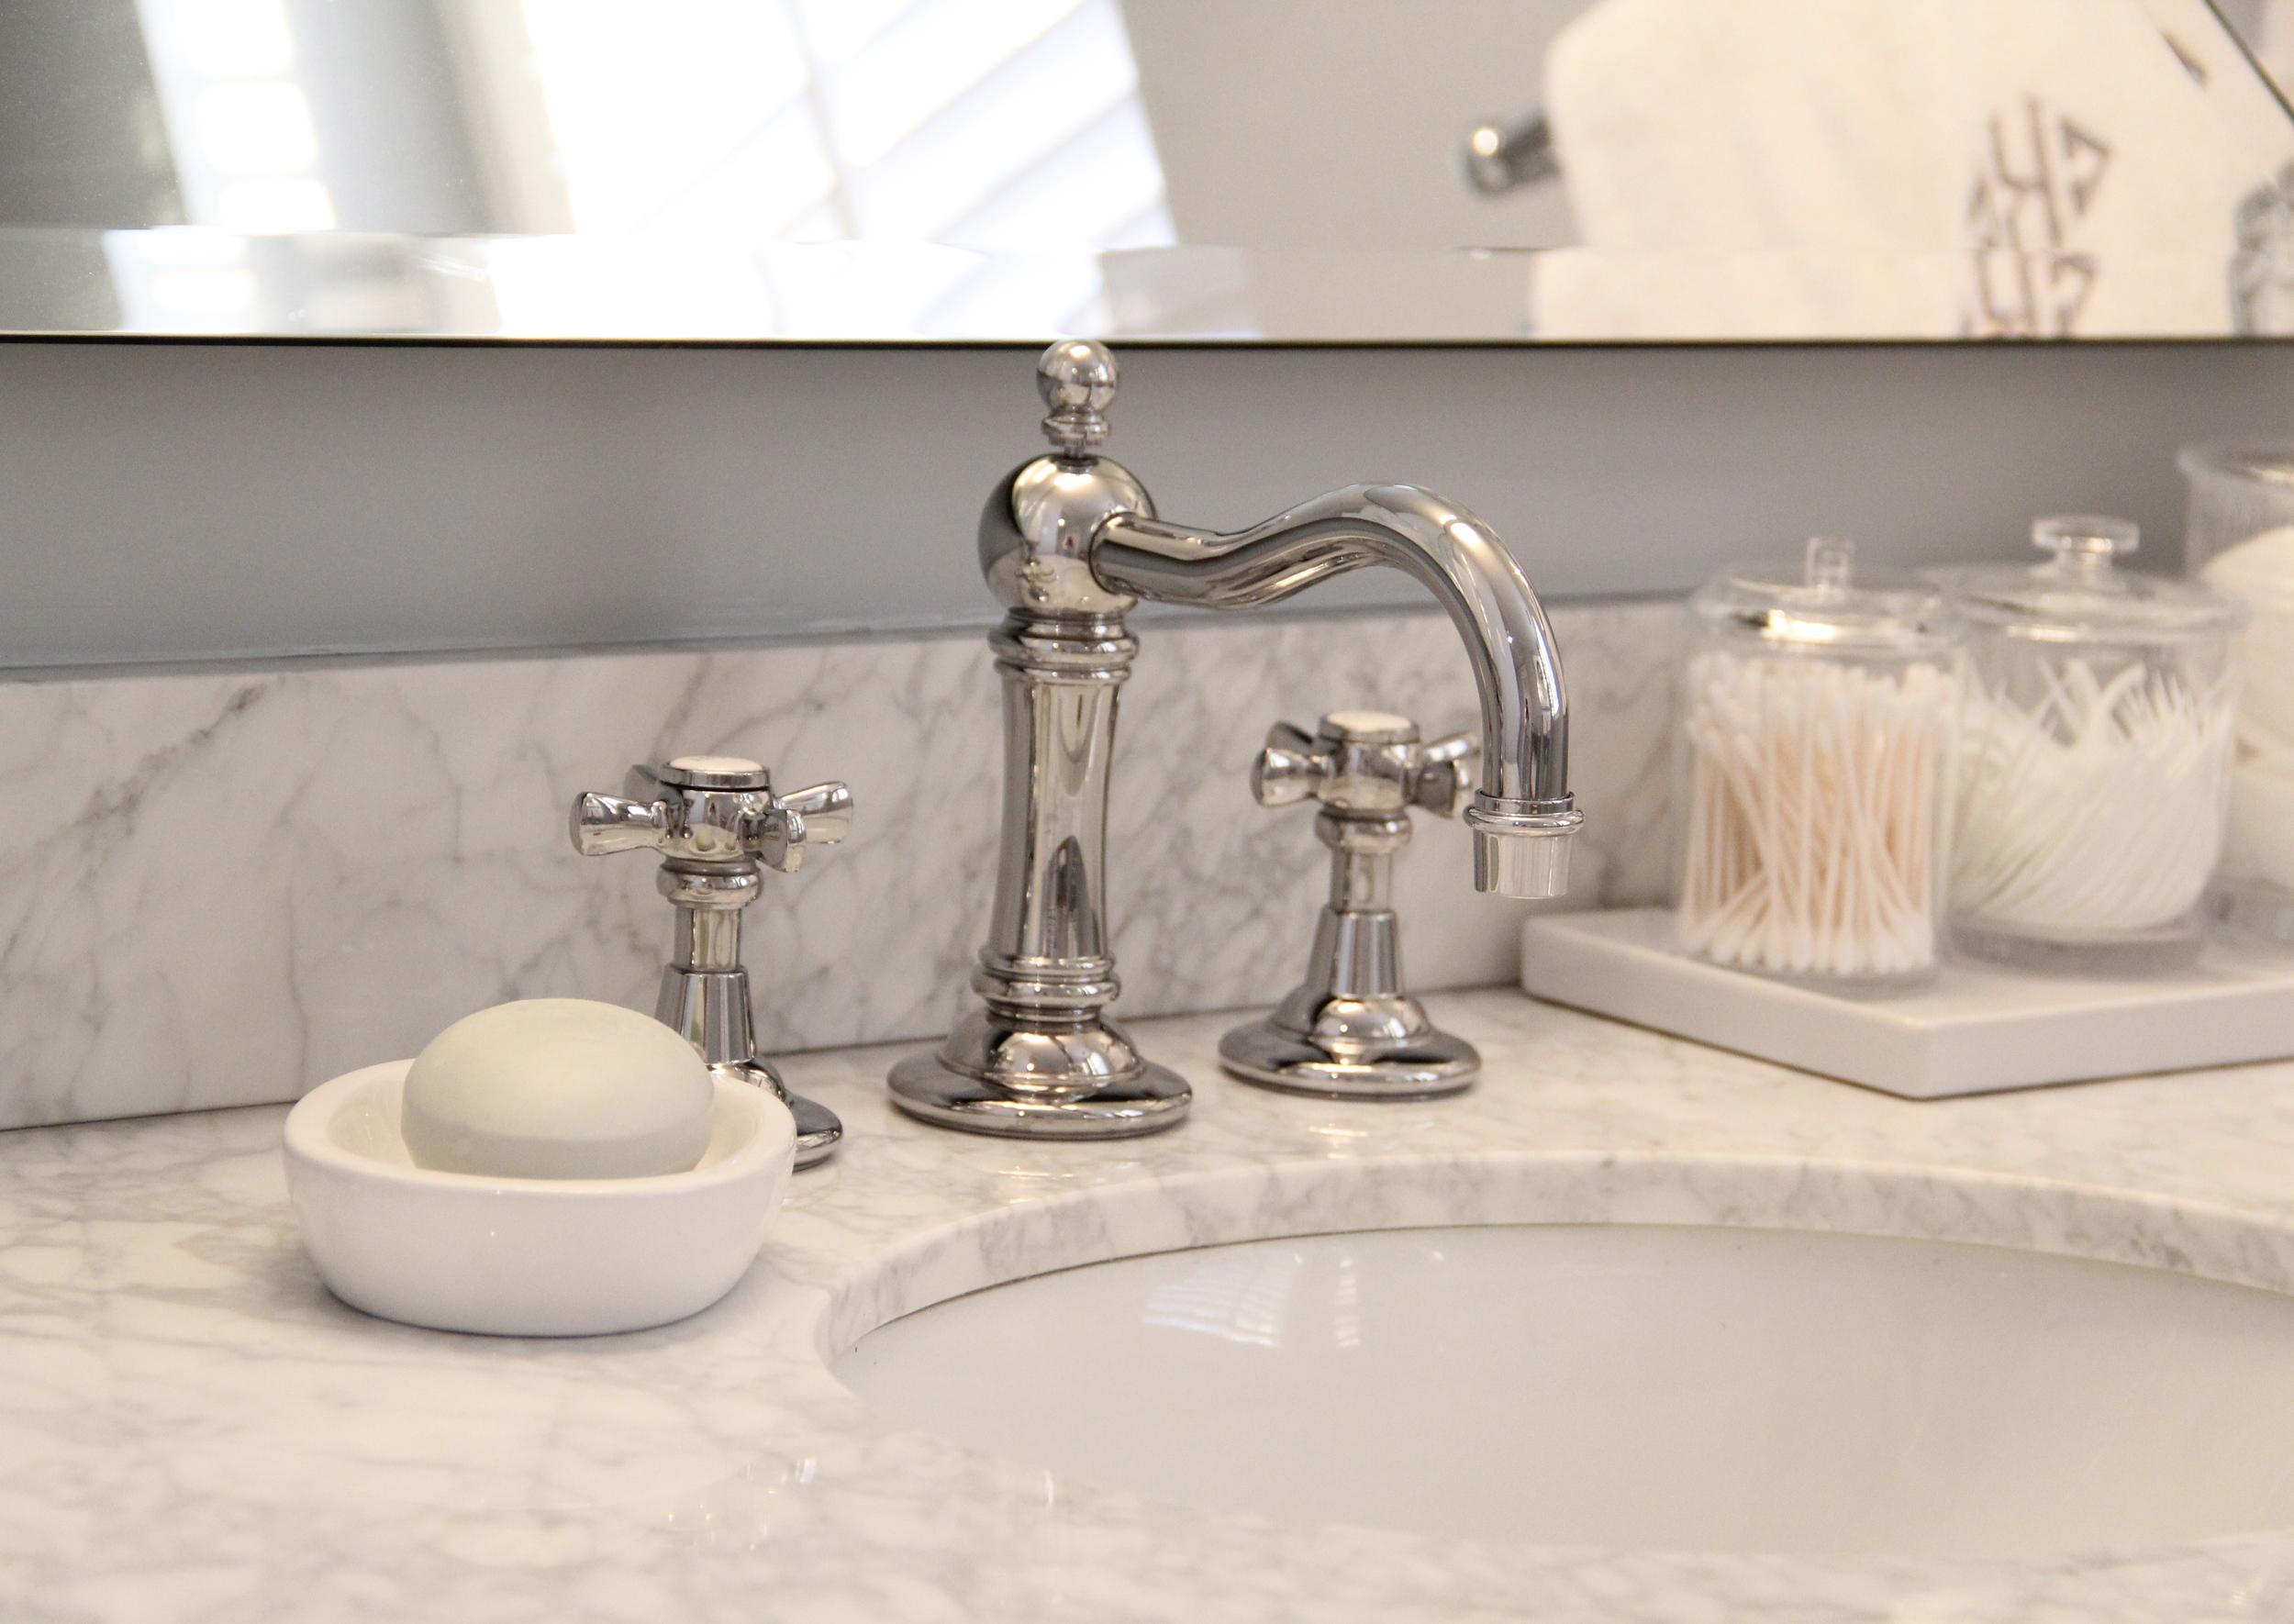 Bathroom Countertop Decor Redefining